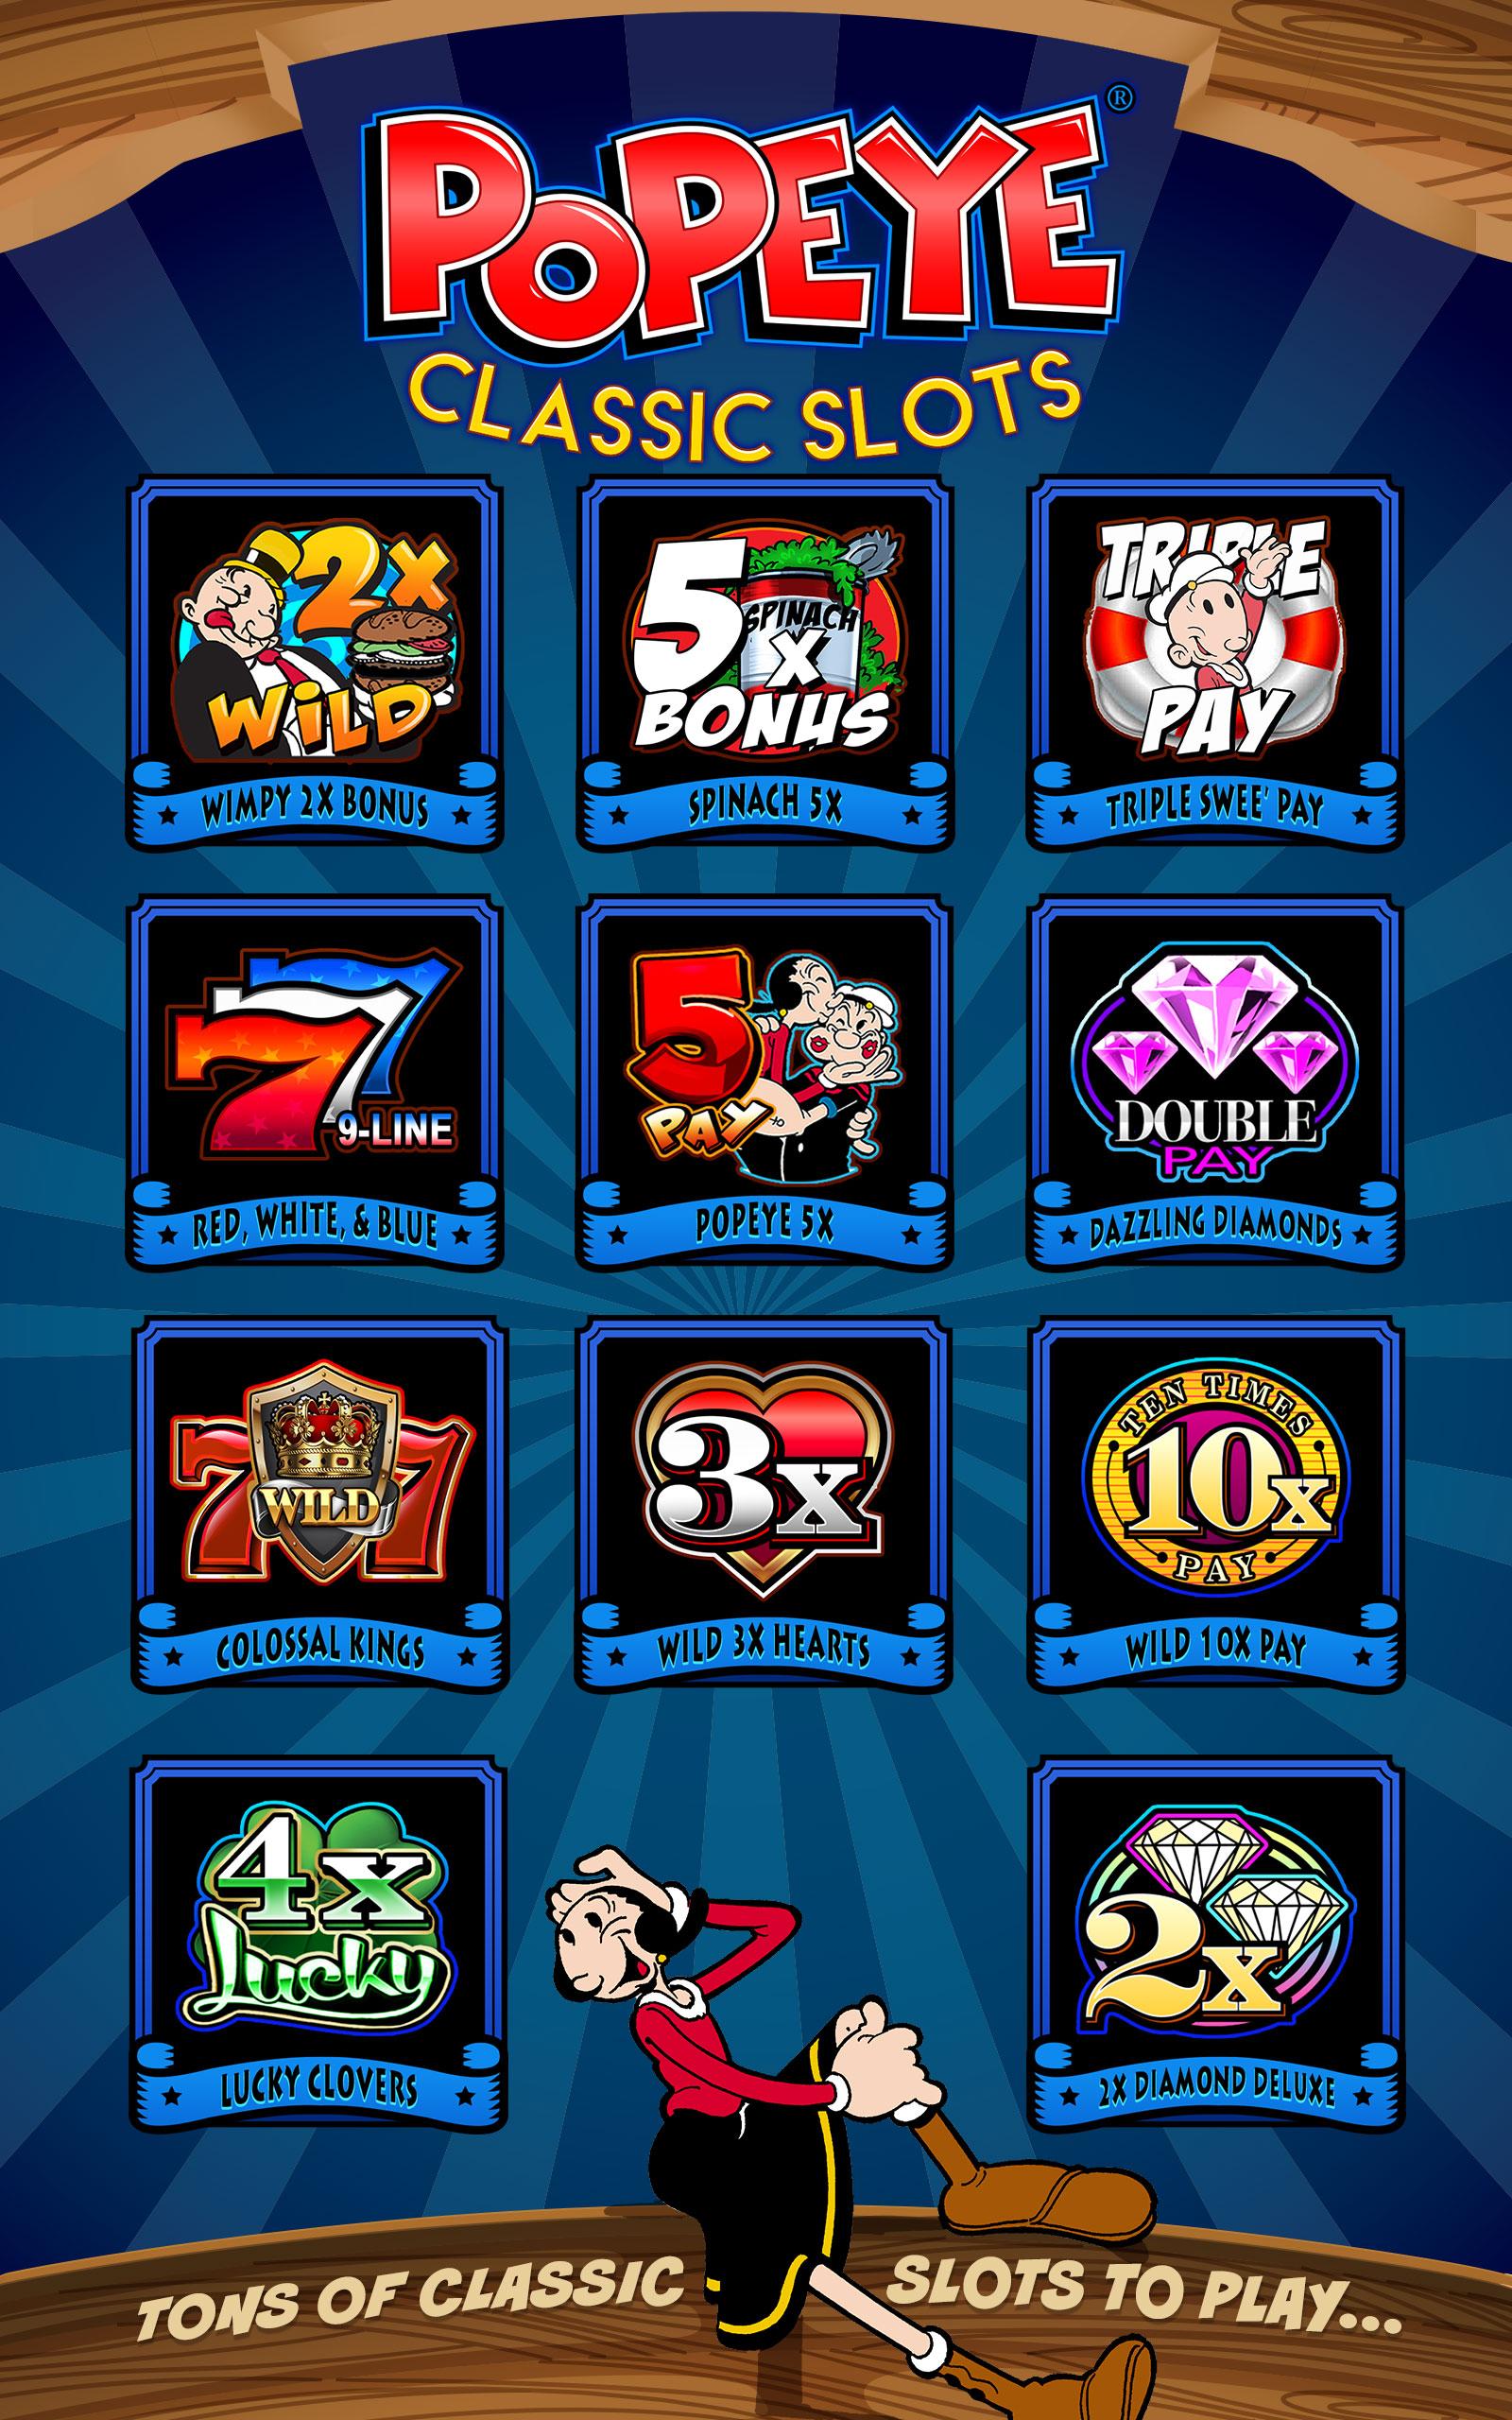 Surf casino bonus code new Sbotan